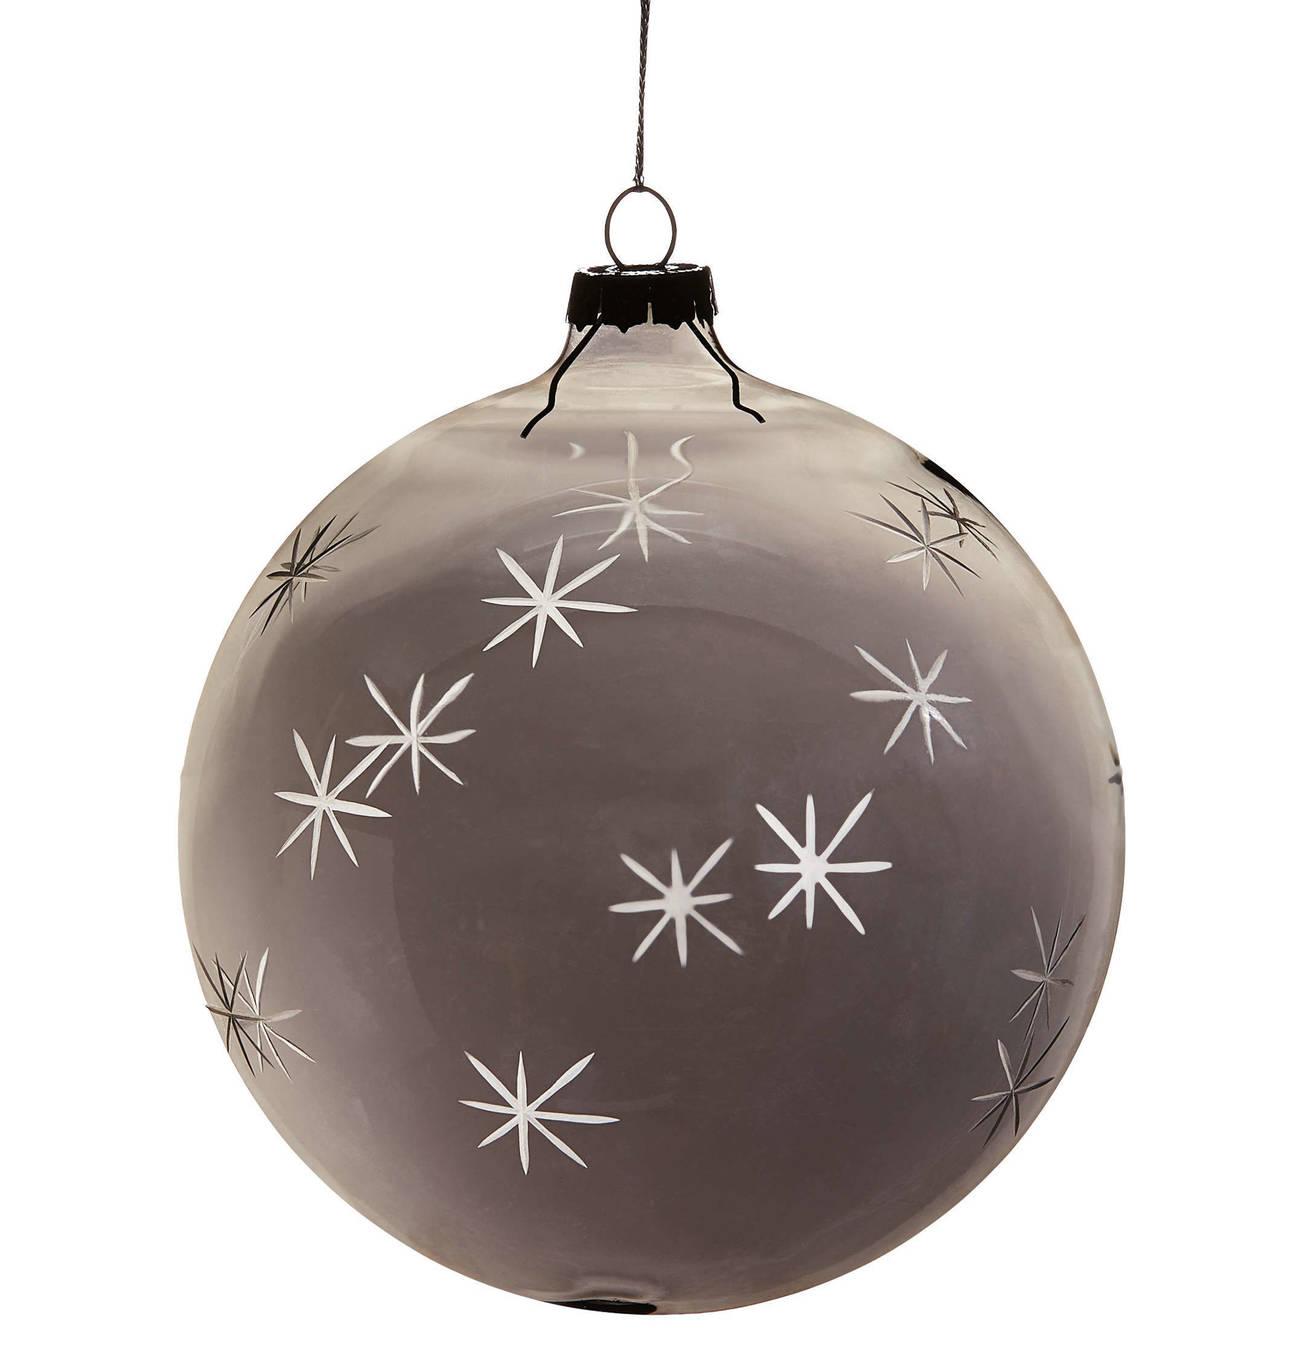 Galeria Kaufhof Christbaumkugeln.Butlers Hang On 4x Weihnachtskugel Mit Sterne O 10 Cm